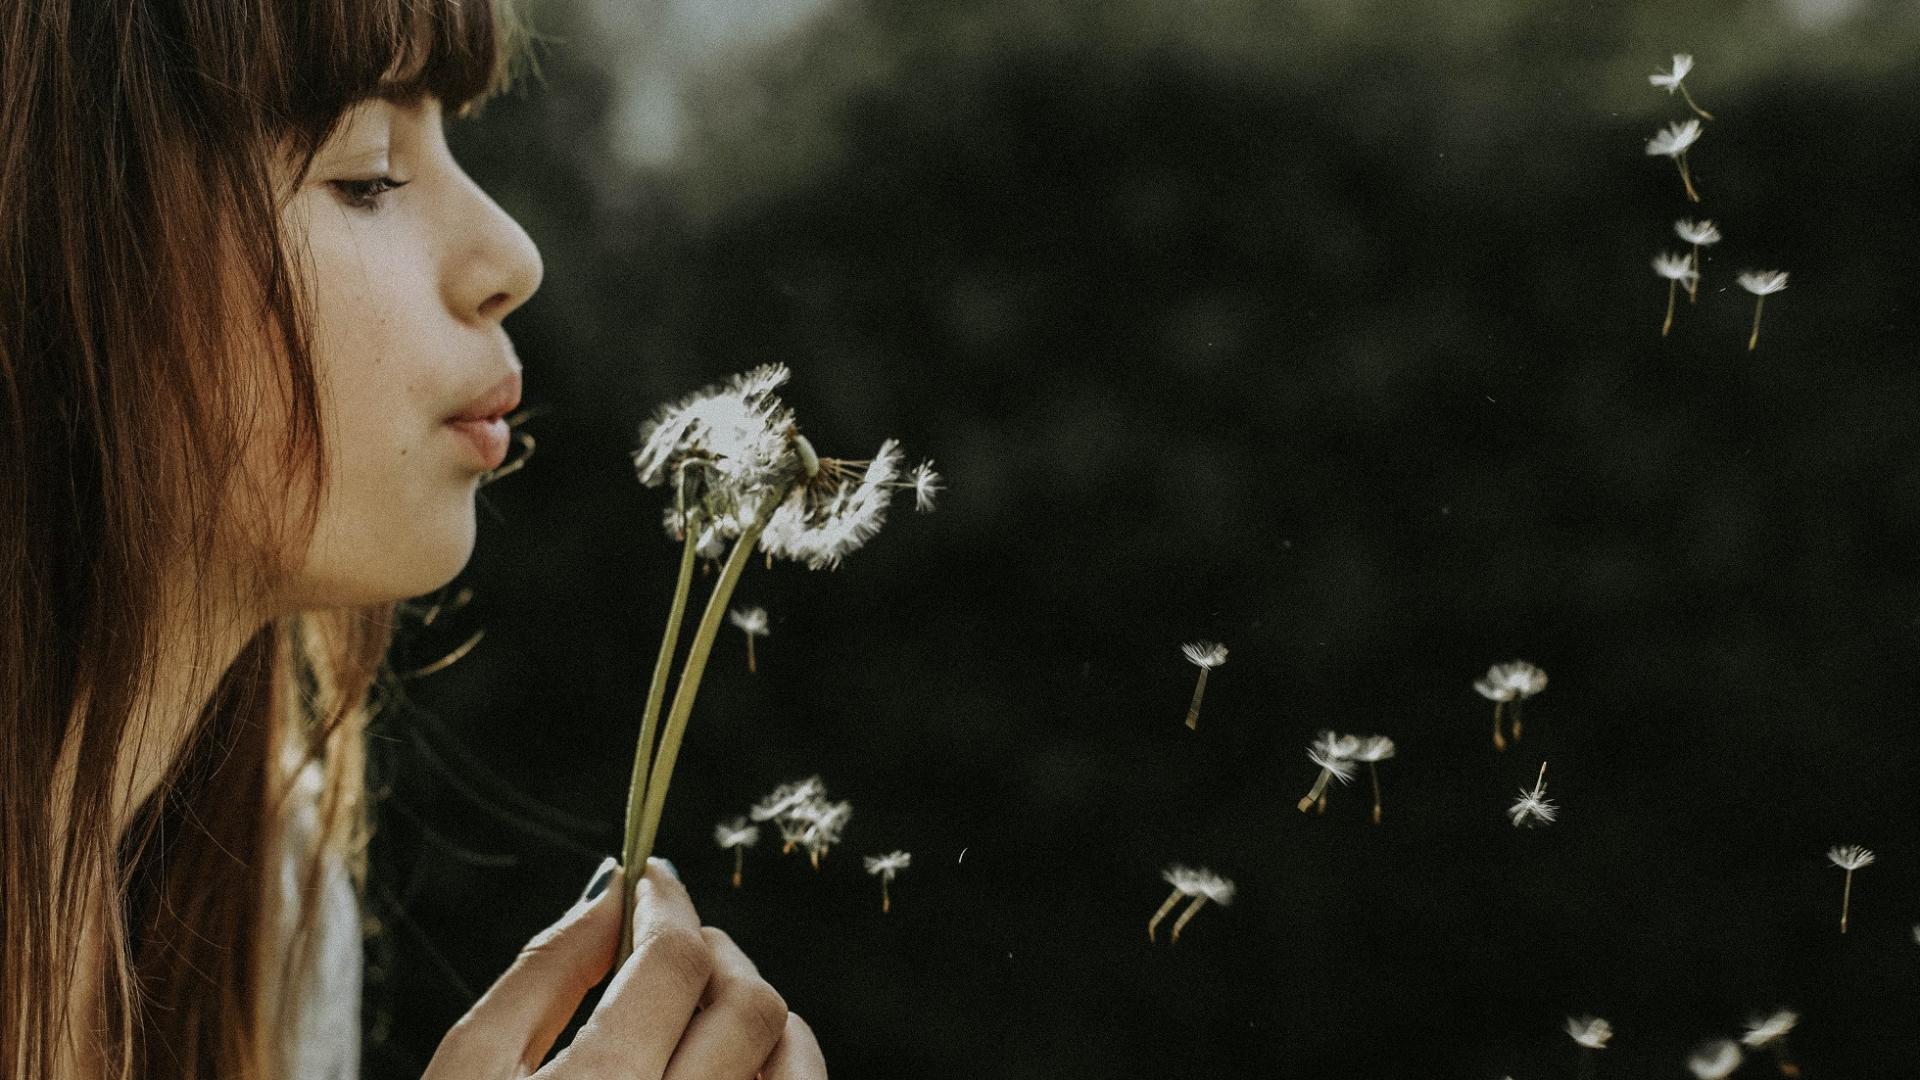 braunhaariges Mädchen pustet Pusteblume